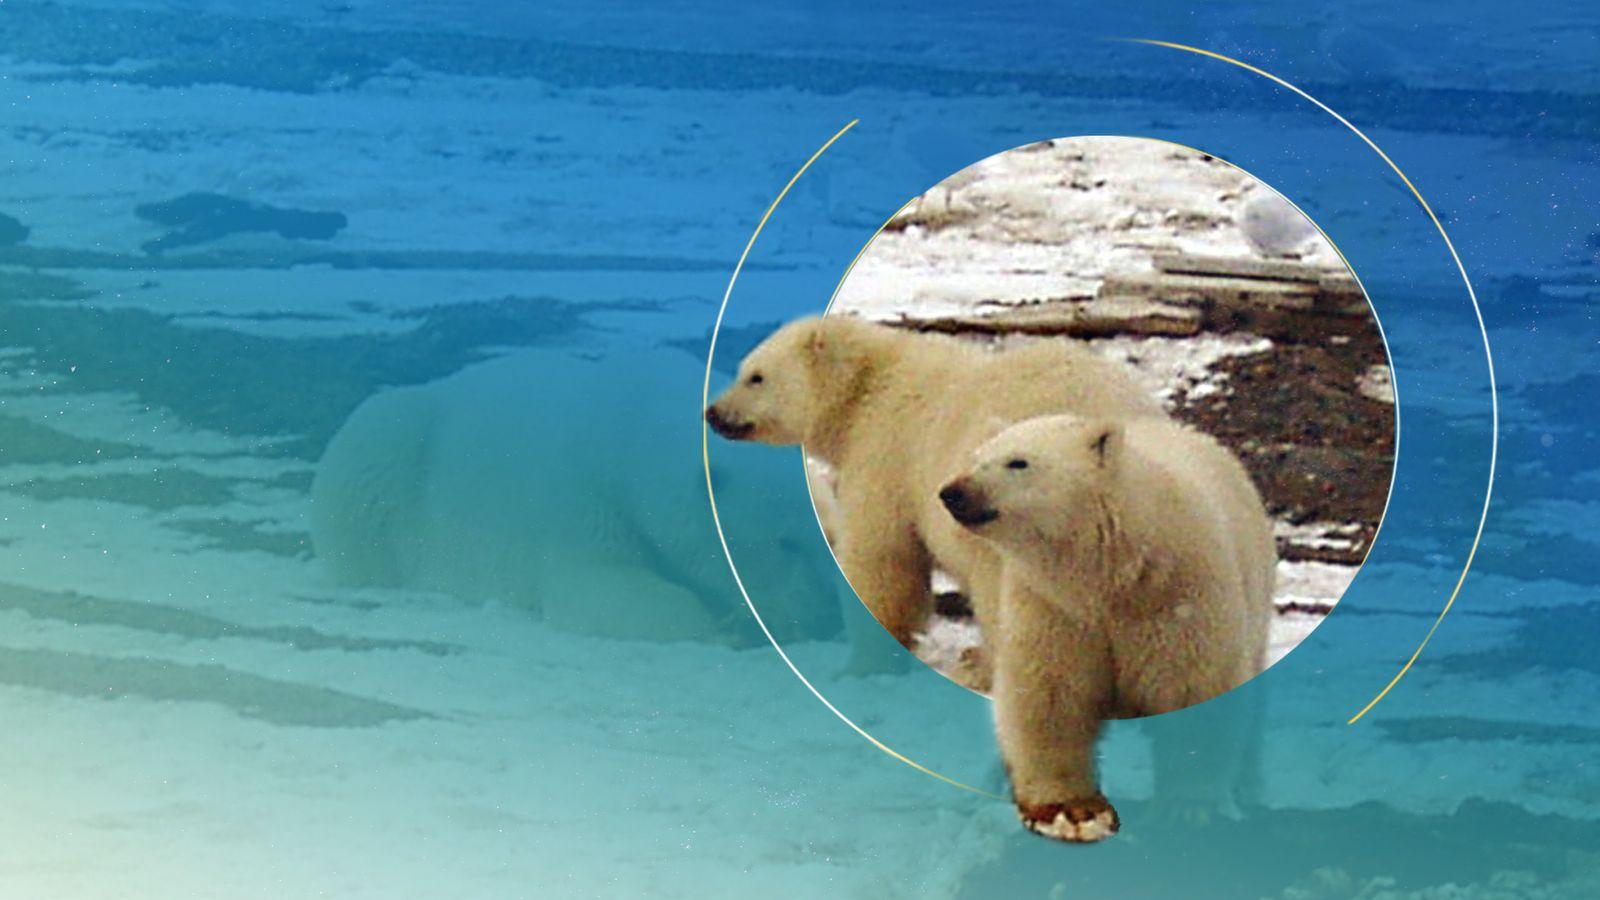 Polar bear inbreeding increasing as Arctic sea ice melts